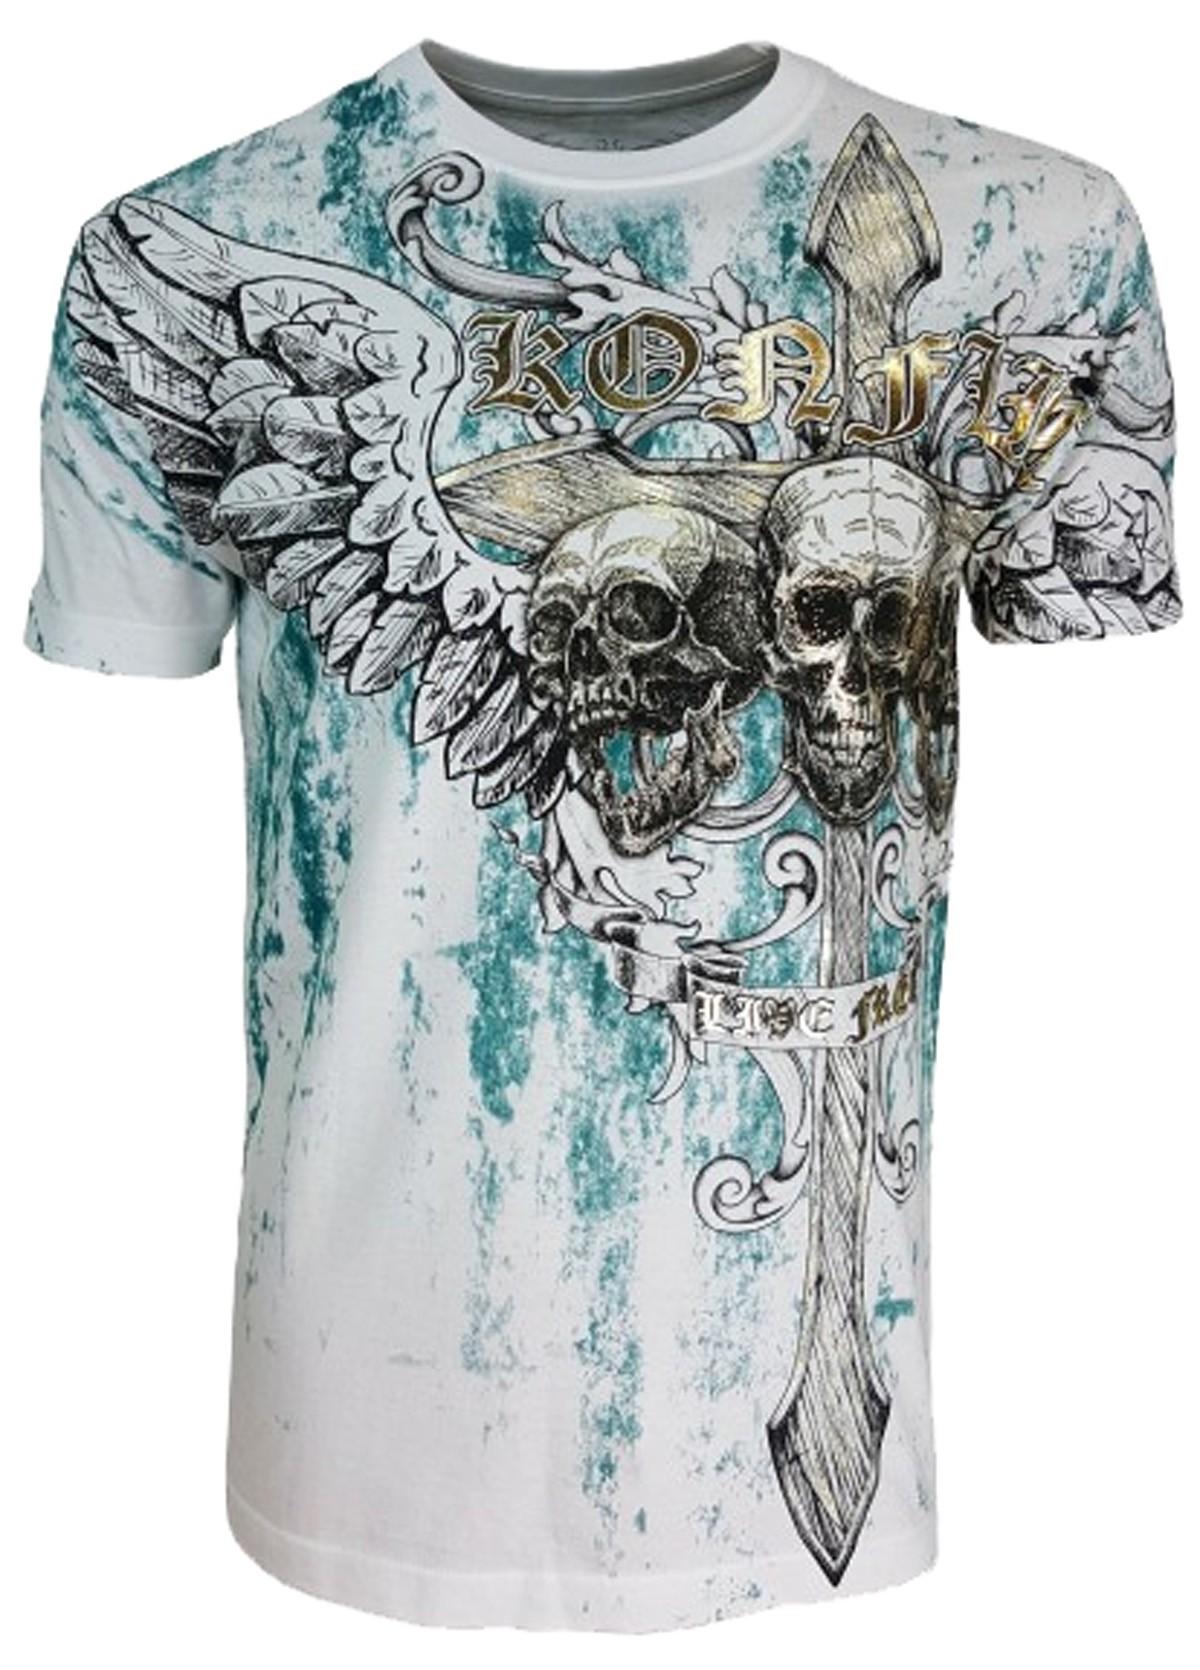 Konflic Clothing - Screaming Skulls T-Shirt